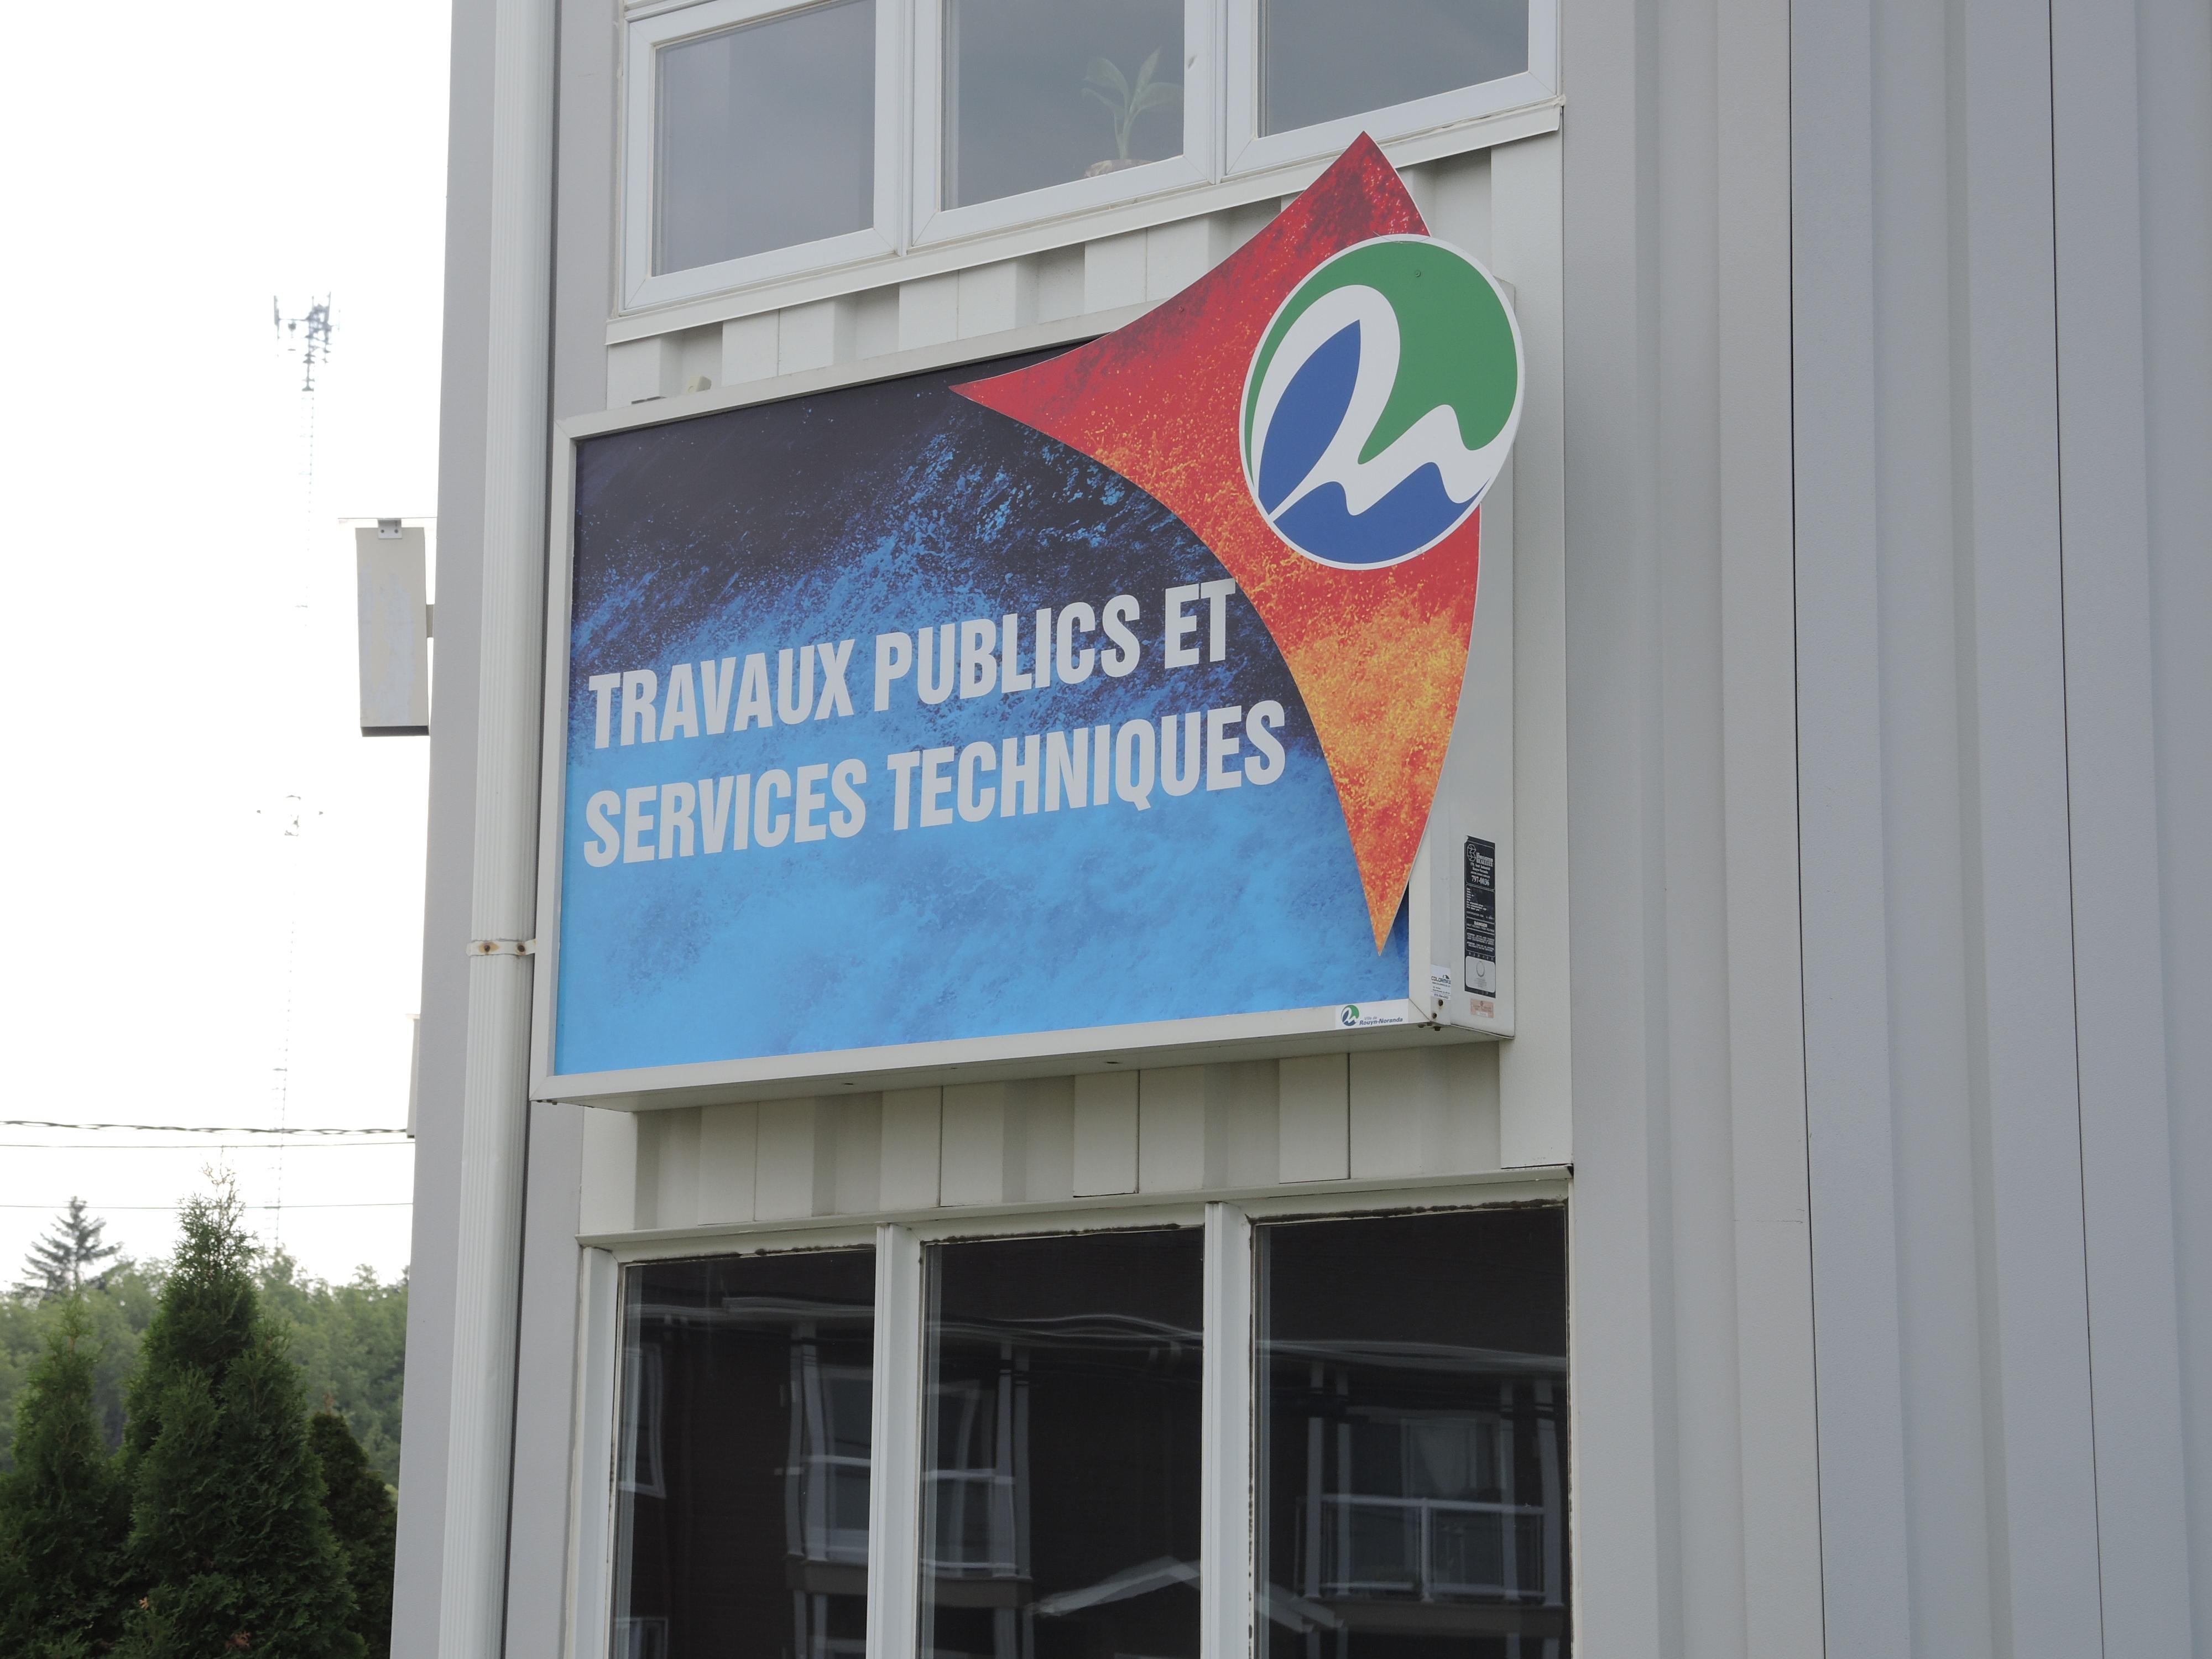 Travaux publics Rouyn-Noranda